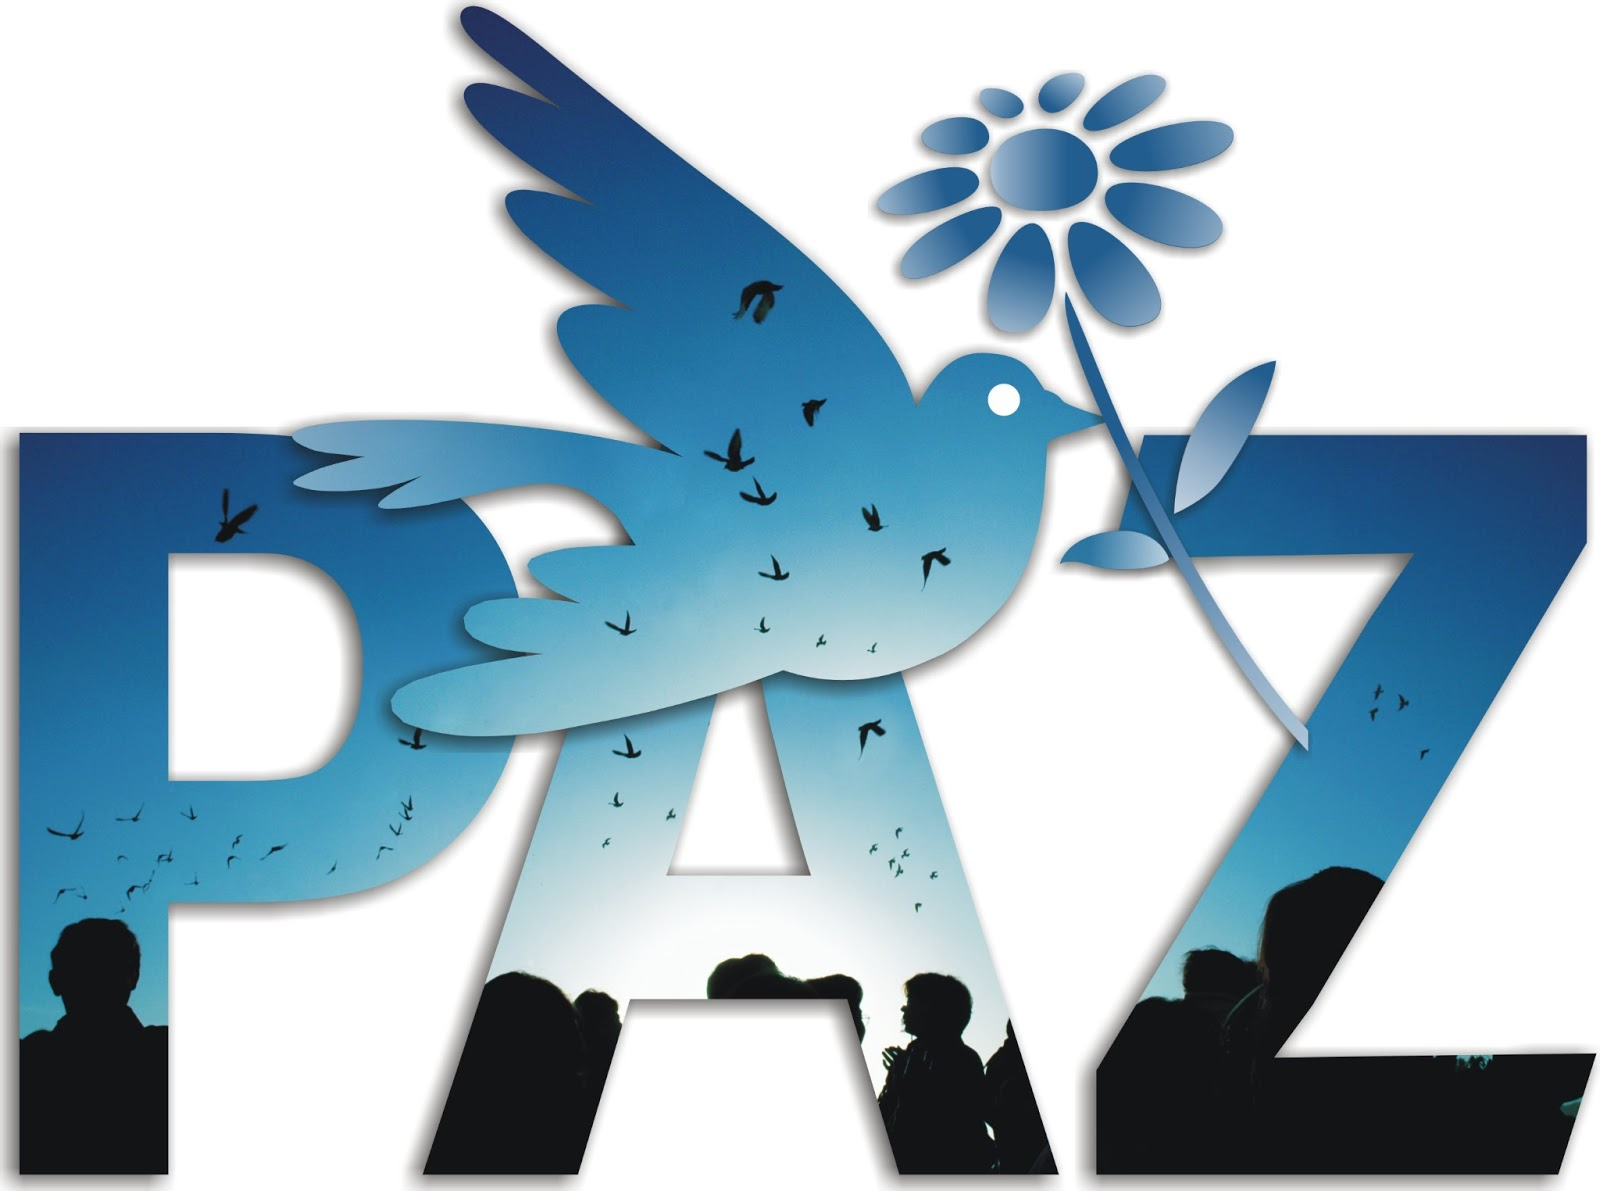 la paz mundial es: